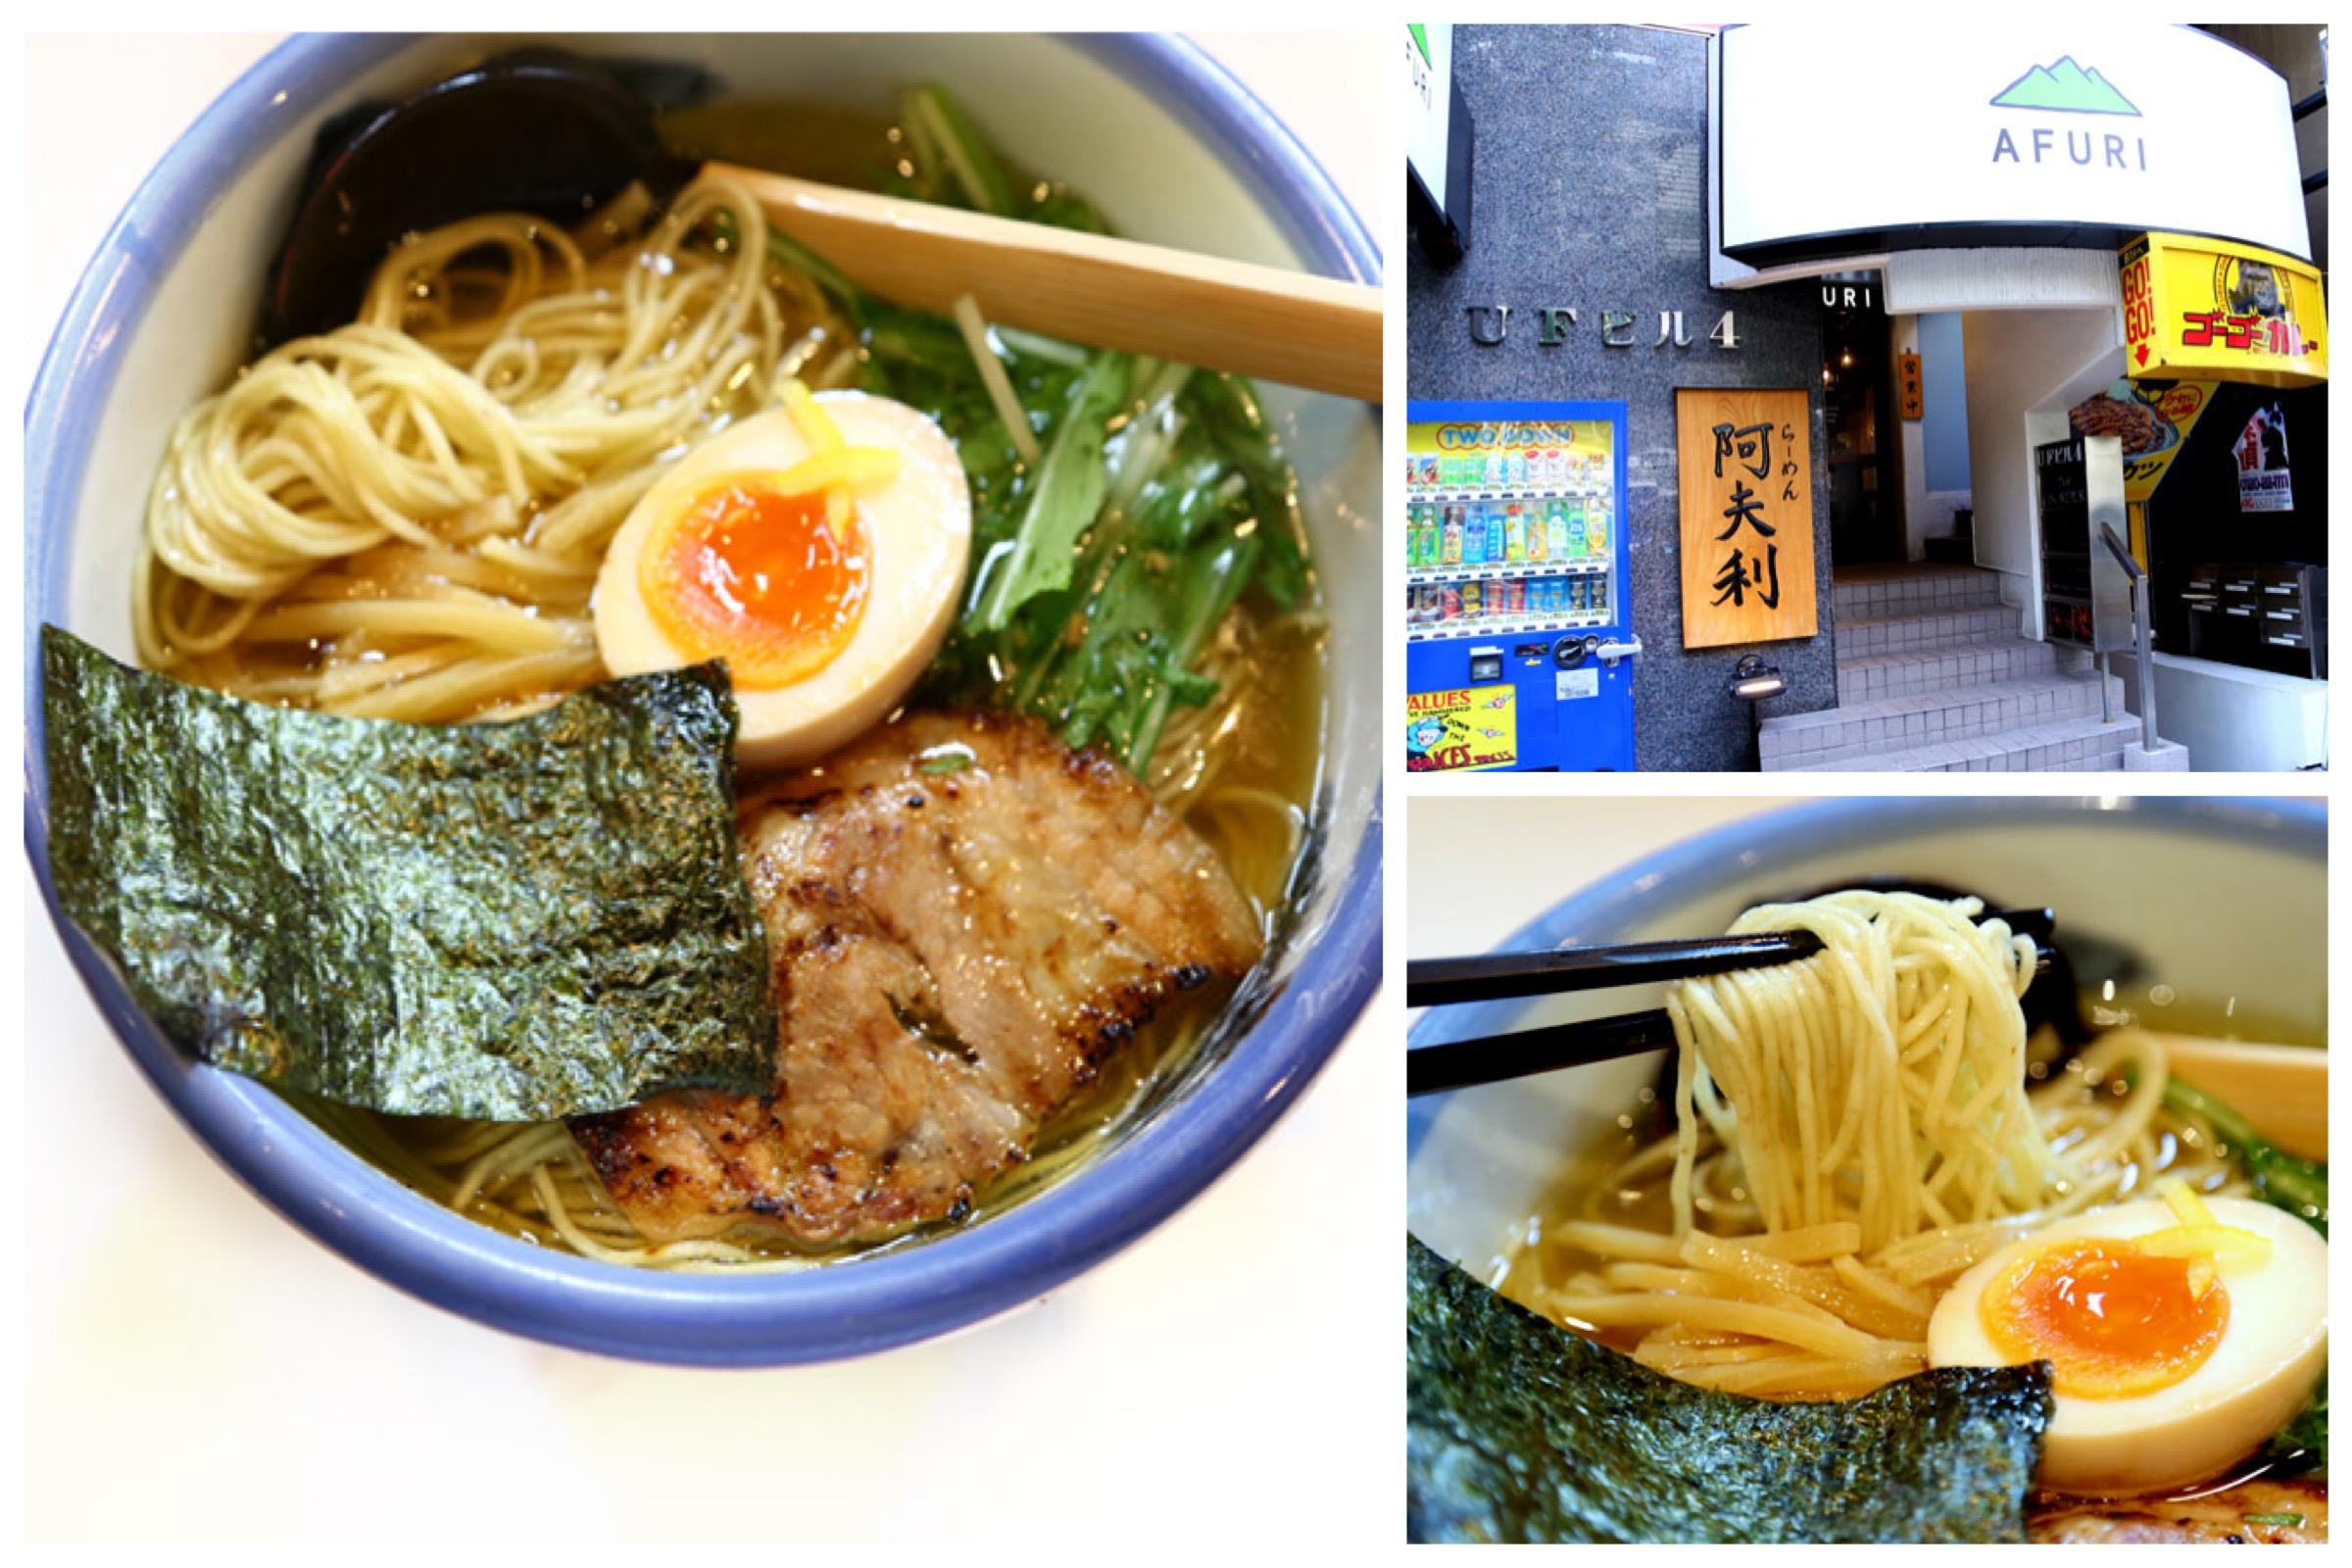 Afuri Ramen 阿夫利 – Popular, Refreshing Yuzu Ramen In Tokyo